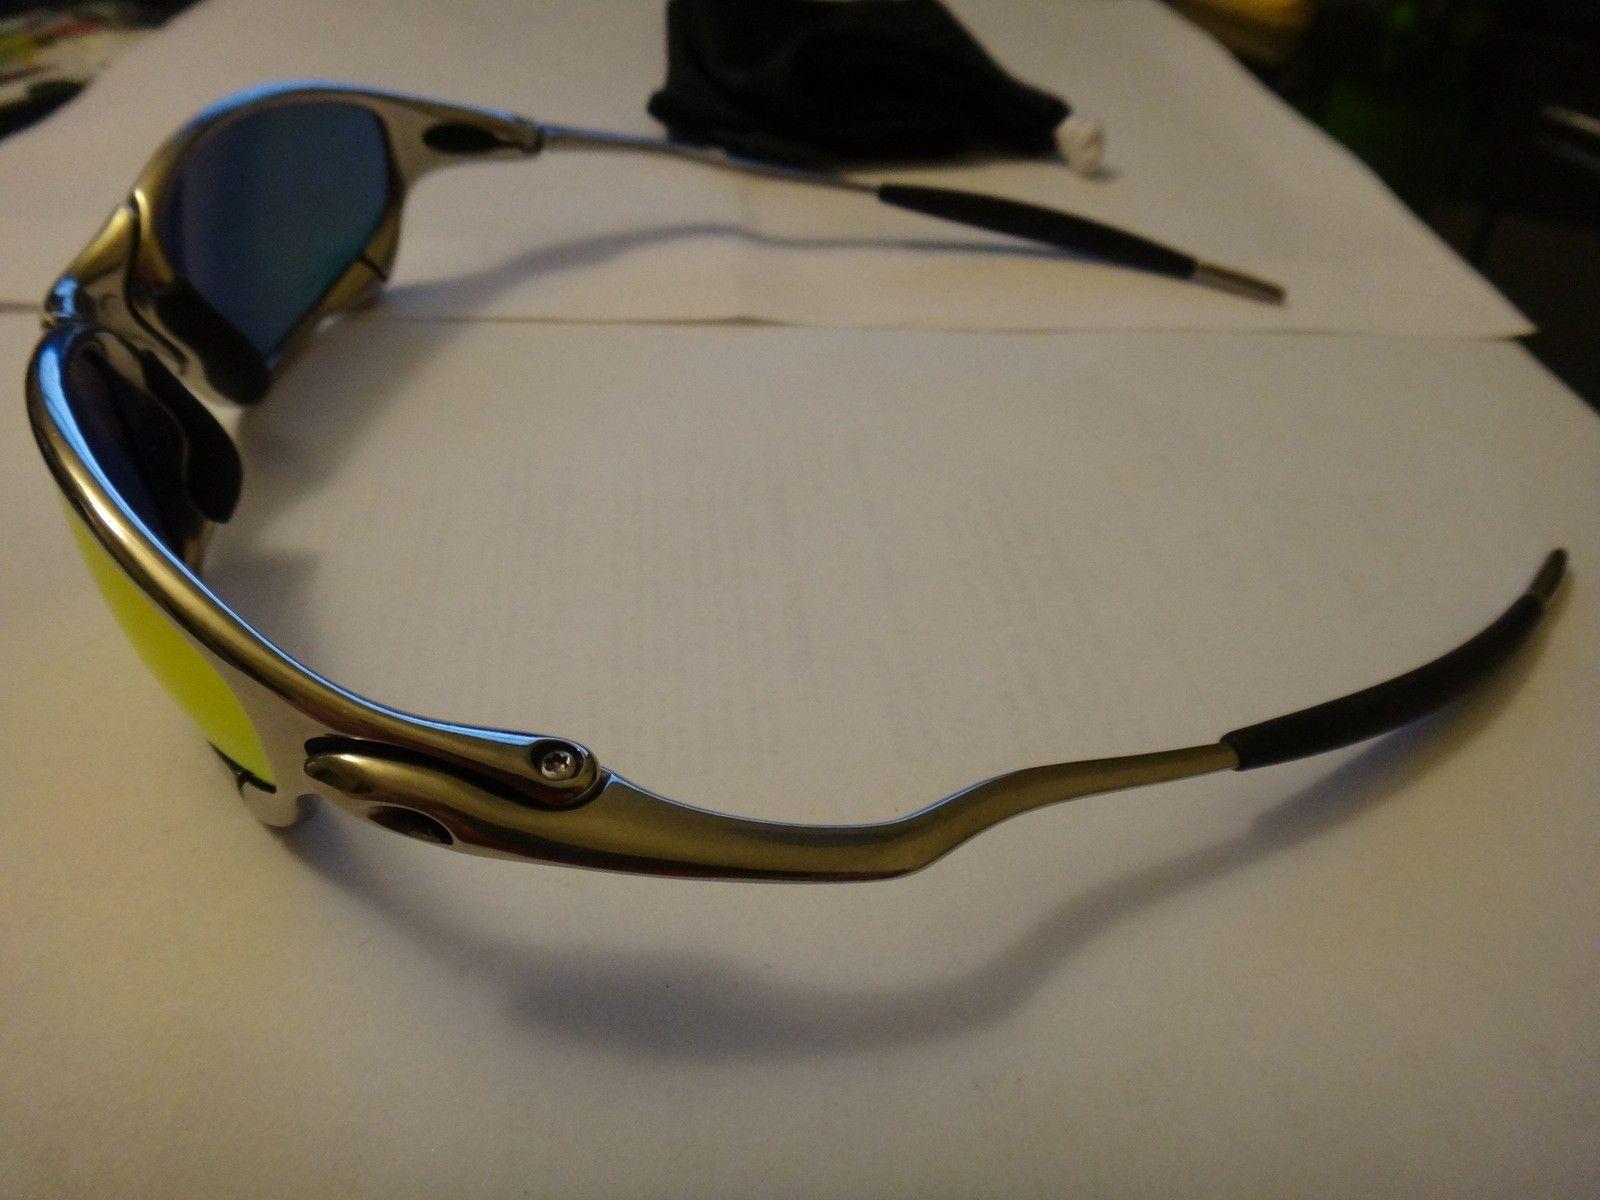 Polished juliet w/ fire iridium polarized lens $365 contUS - DSC07476.JPG